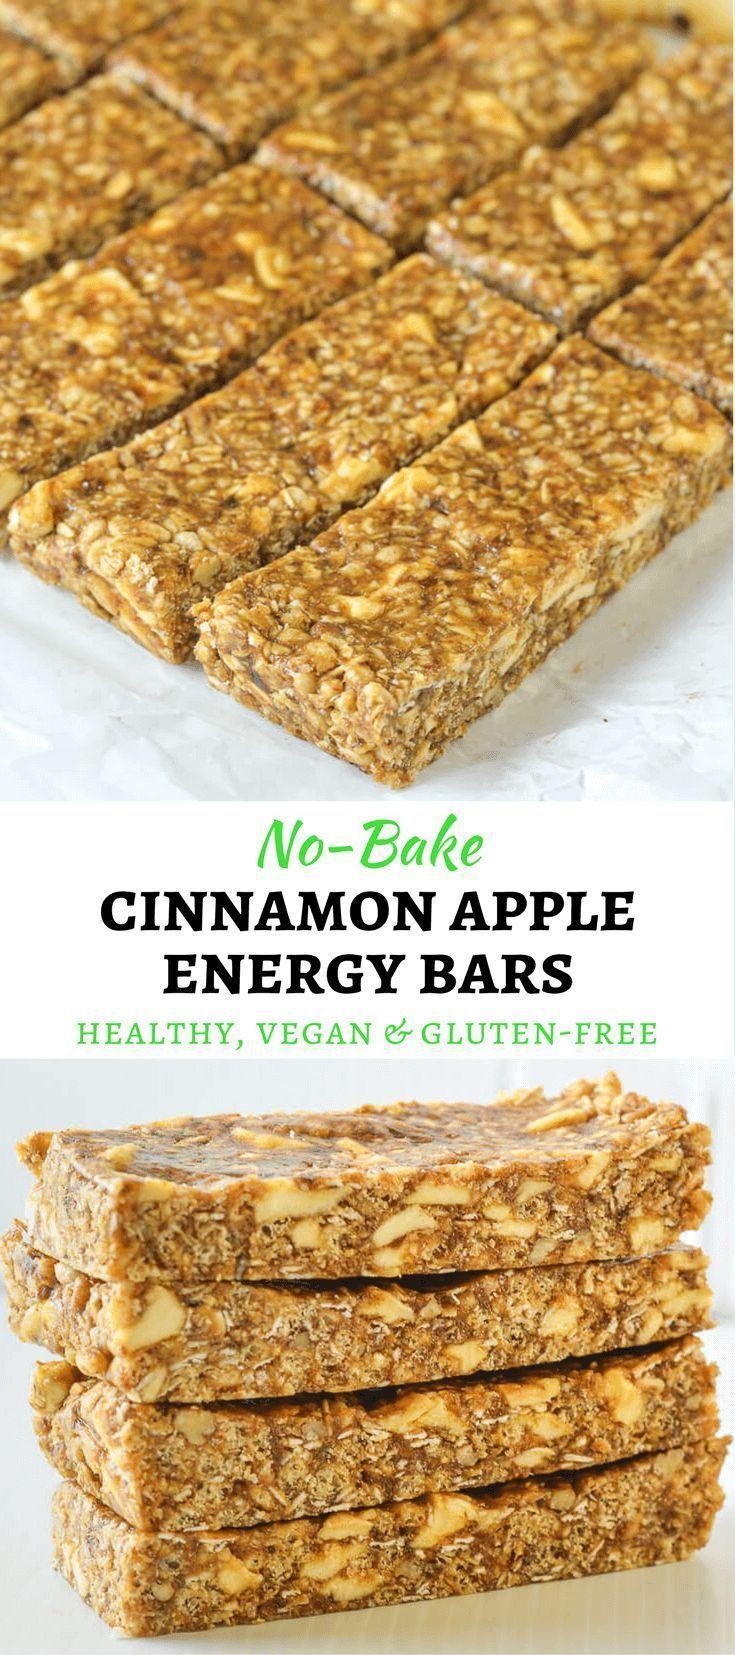 Incredibly delicious No-Bake Cinnamon Apple Energy Bars. A delicious mix of chewy & crispy & so quick & easy to make!  via /avirtualvegan/